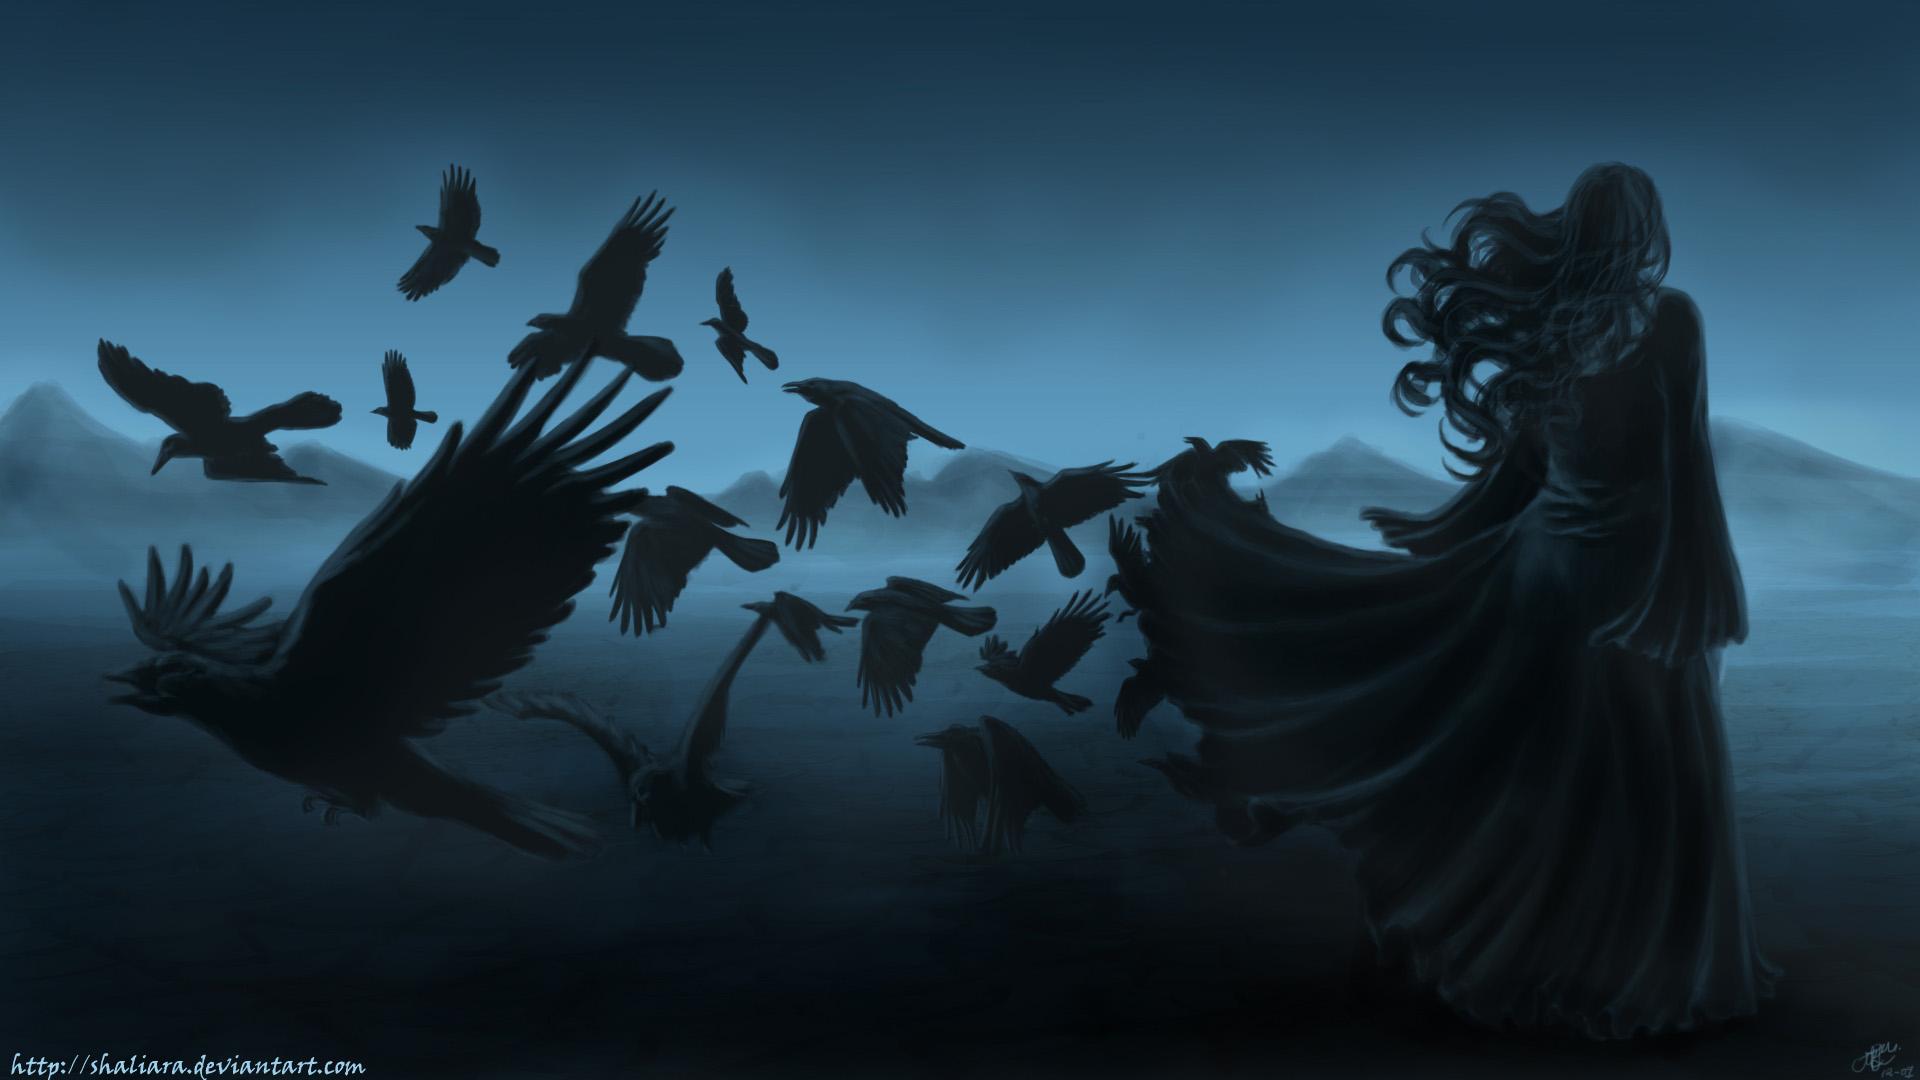 dark horror gothic women raven poe birds art mood wallpaper background 1920x1080